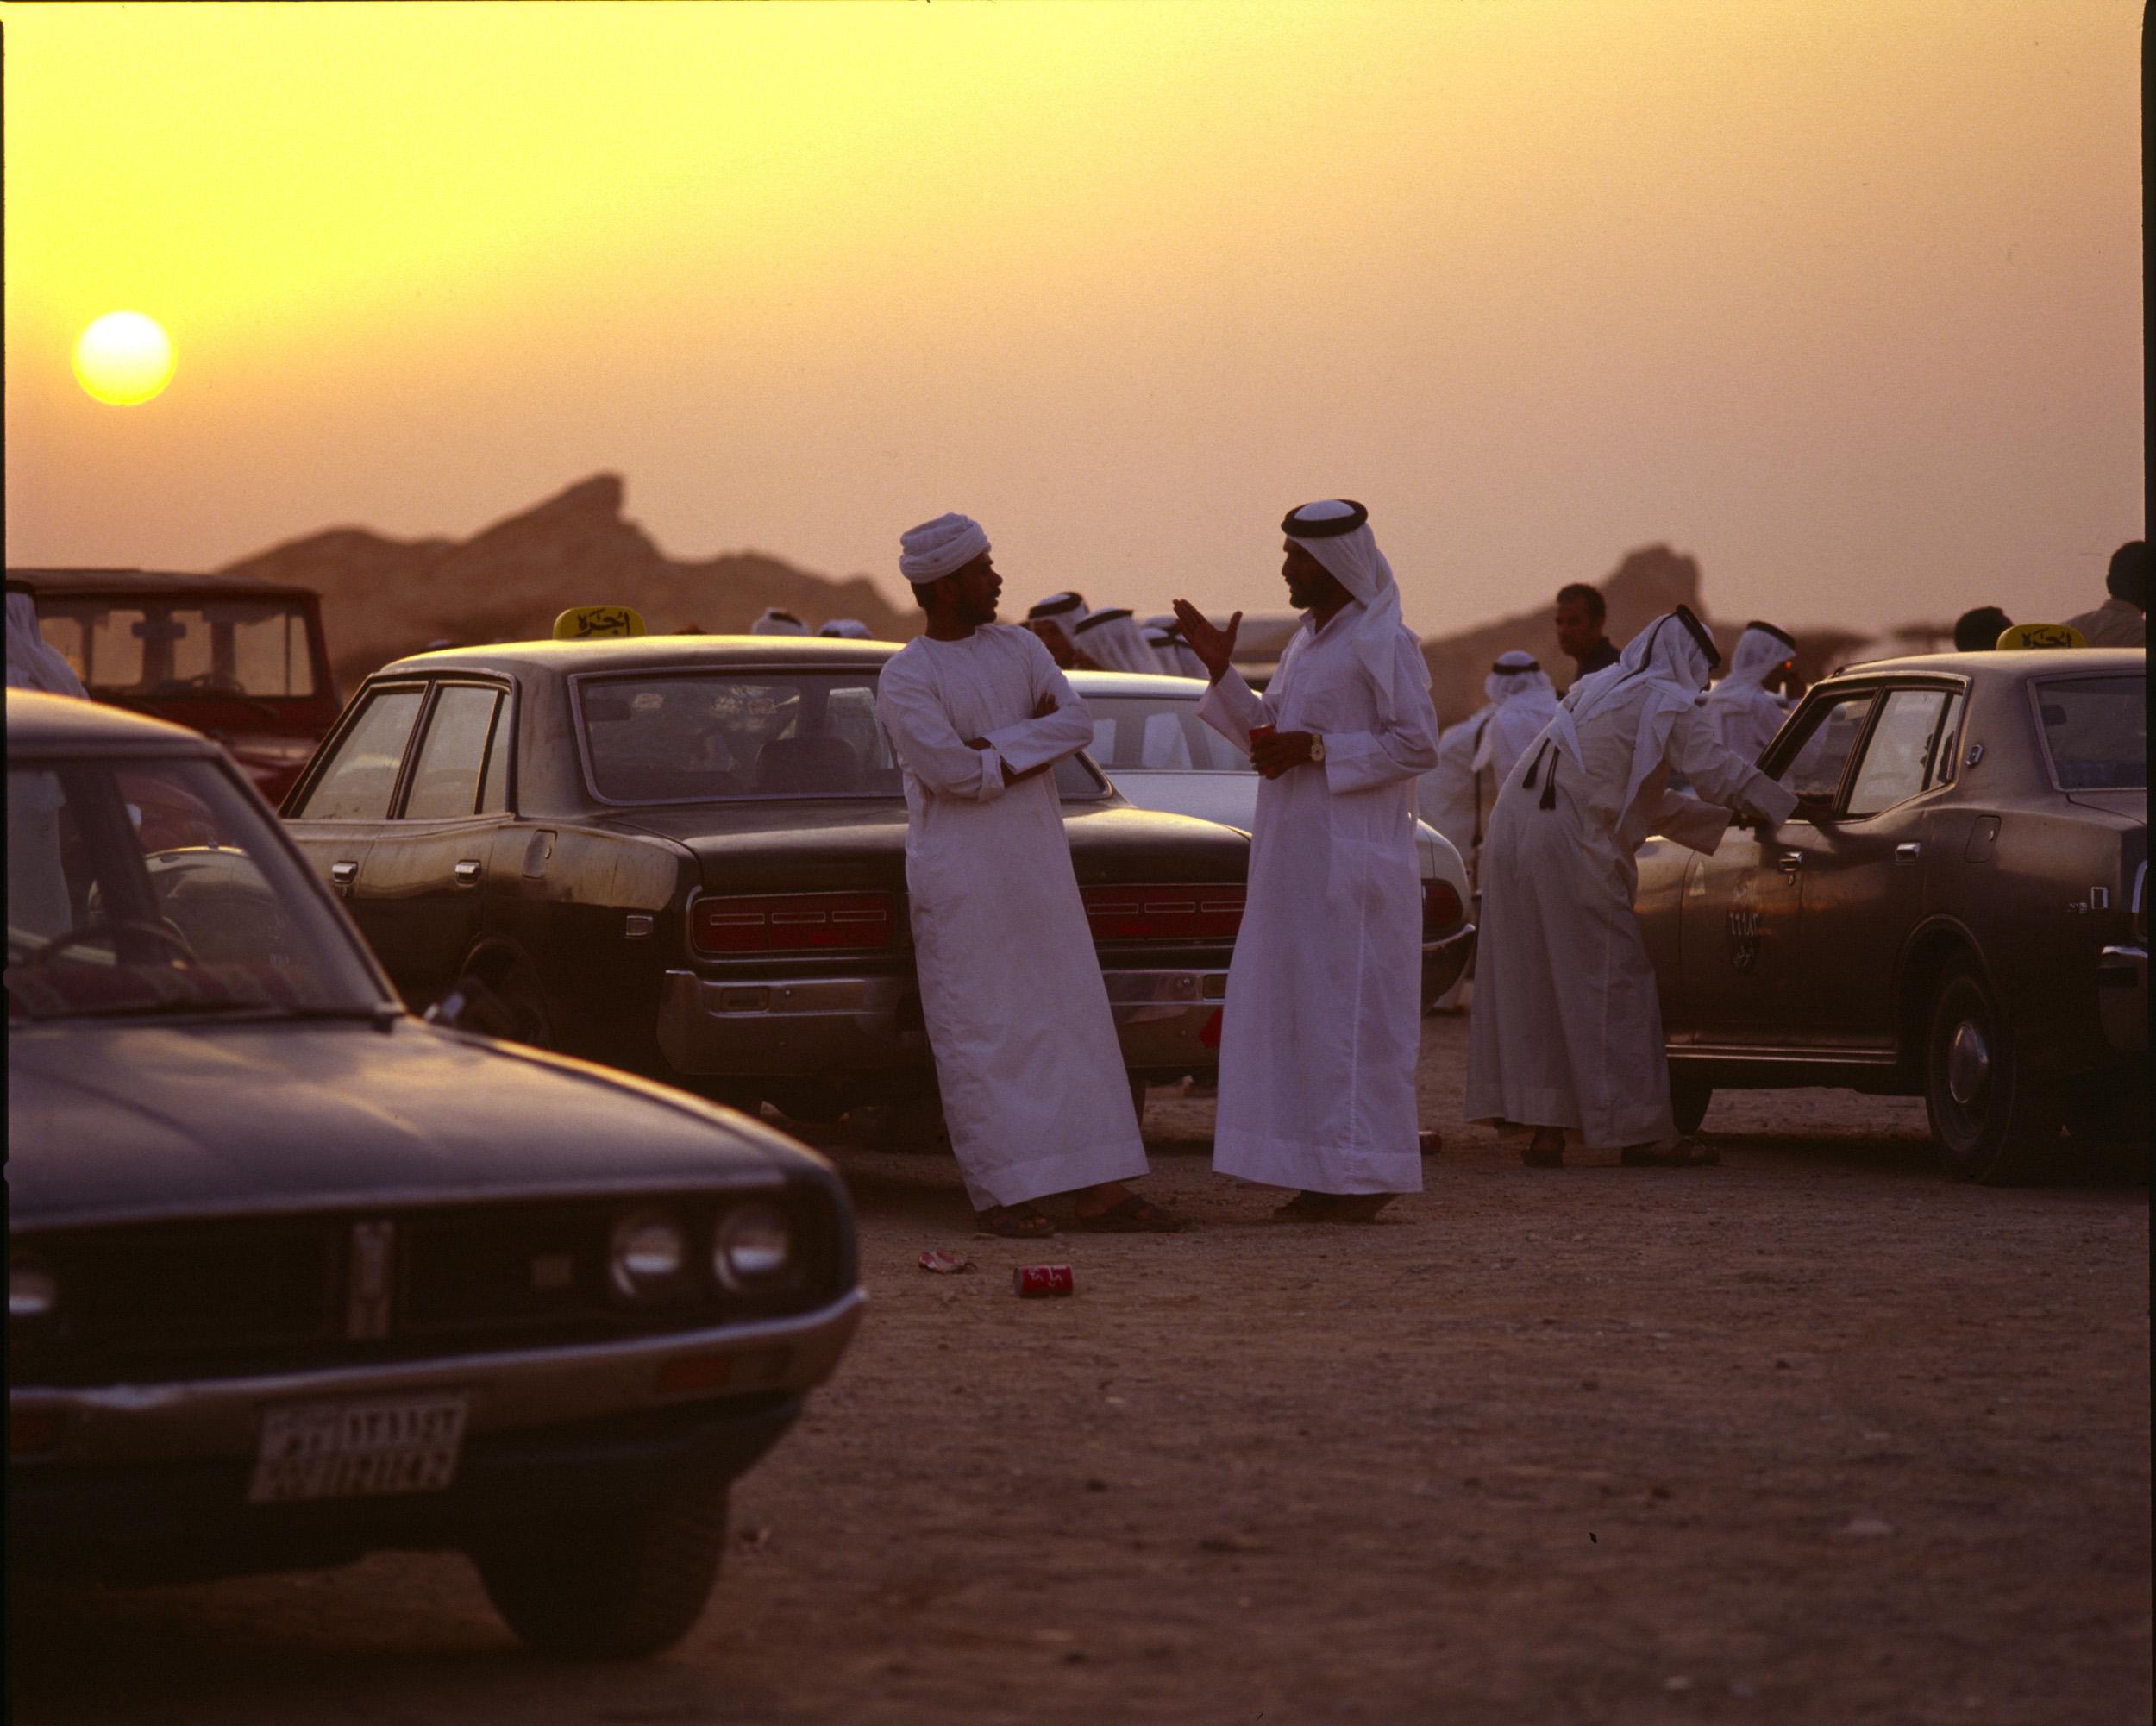 Al Ain, UAE, 1980